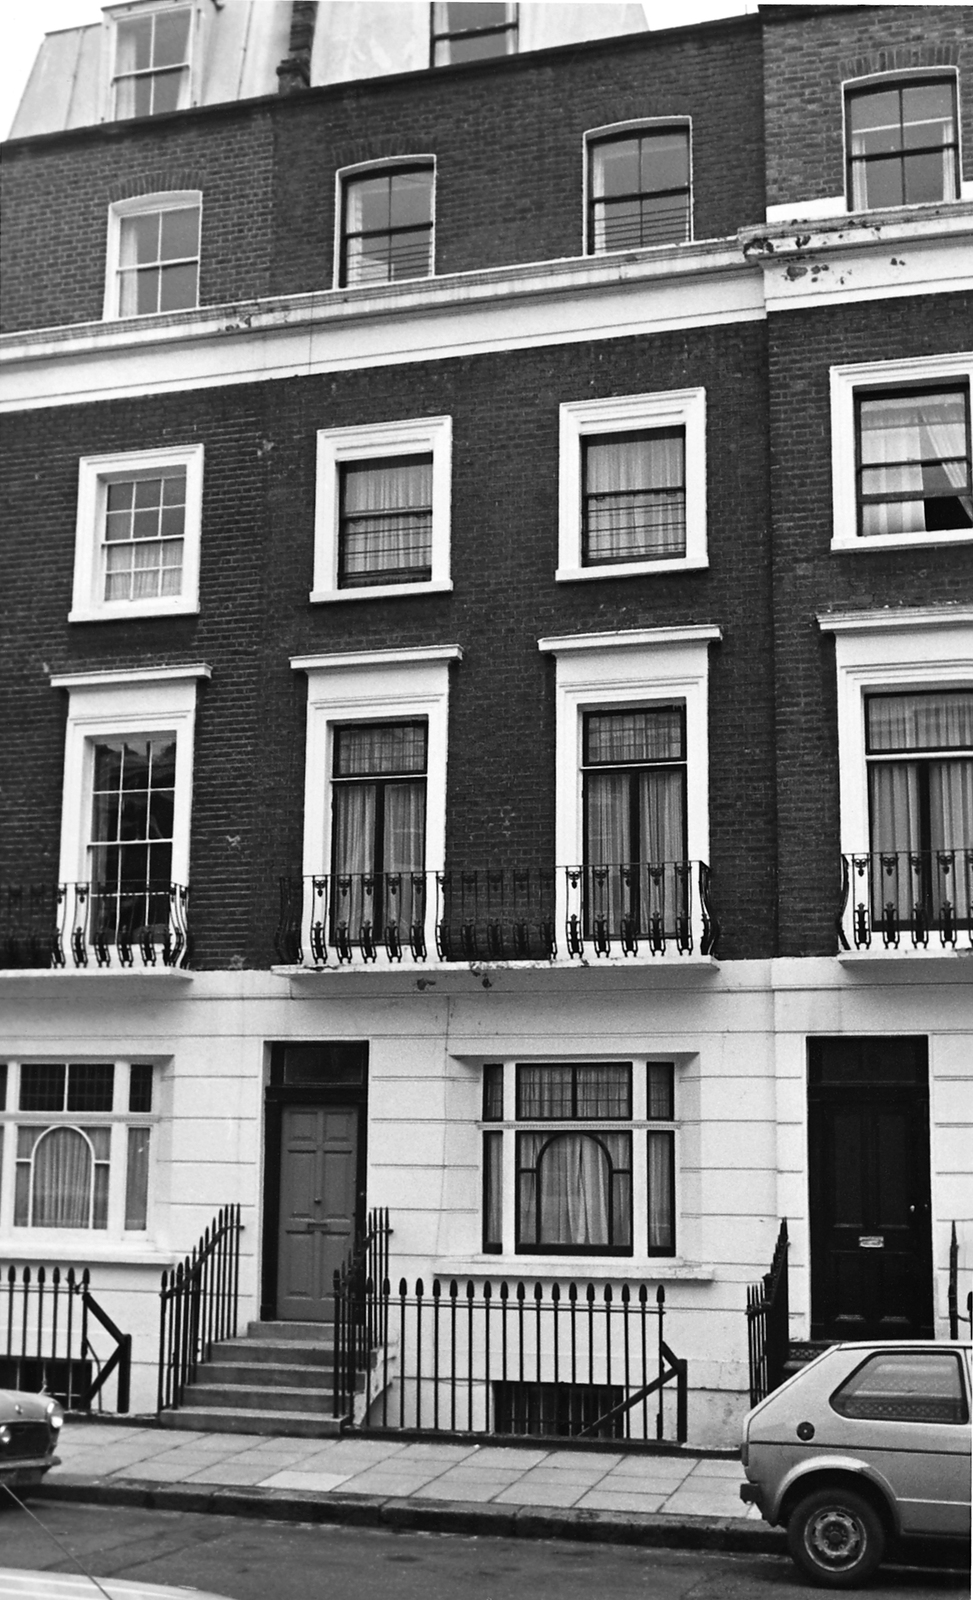 London - Executive Level Position Residence